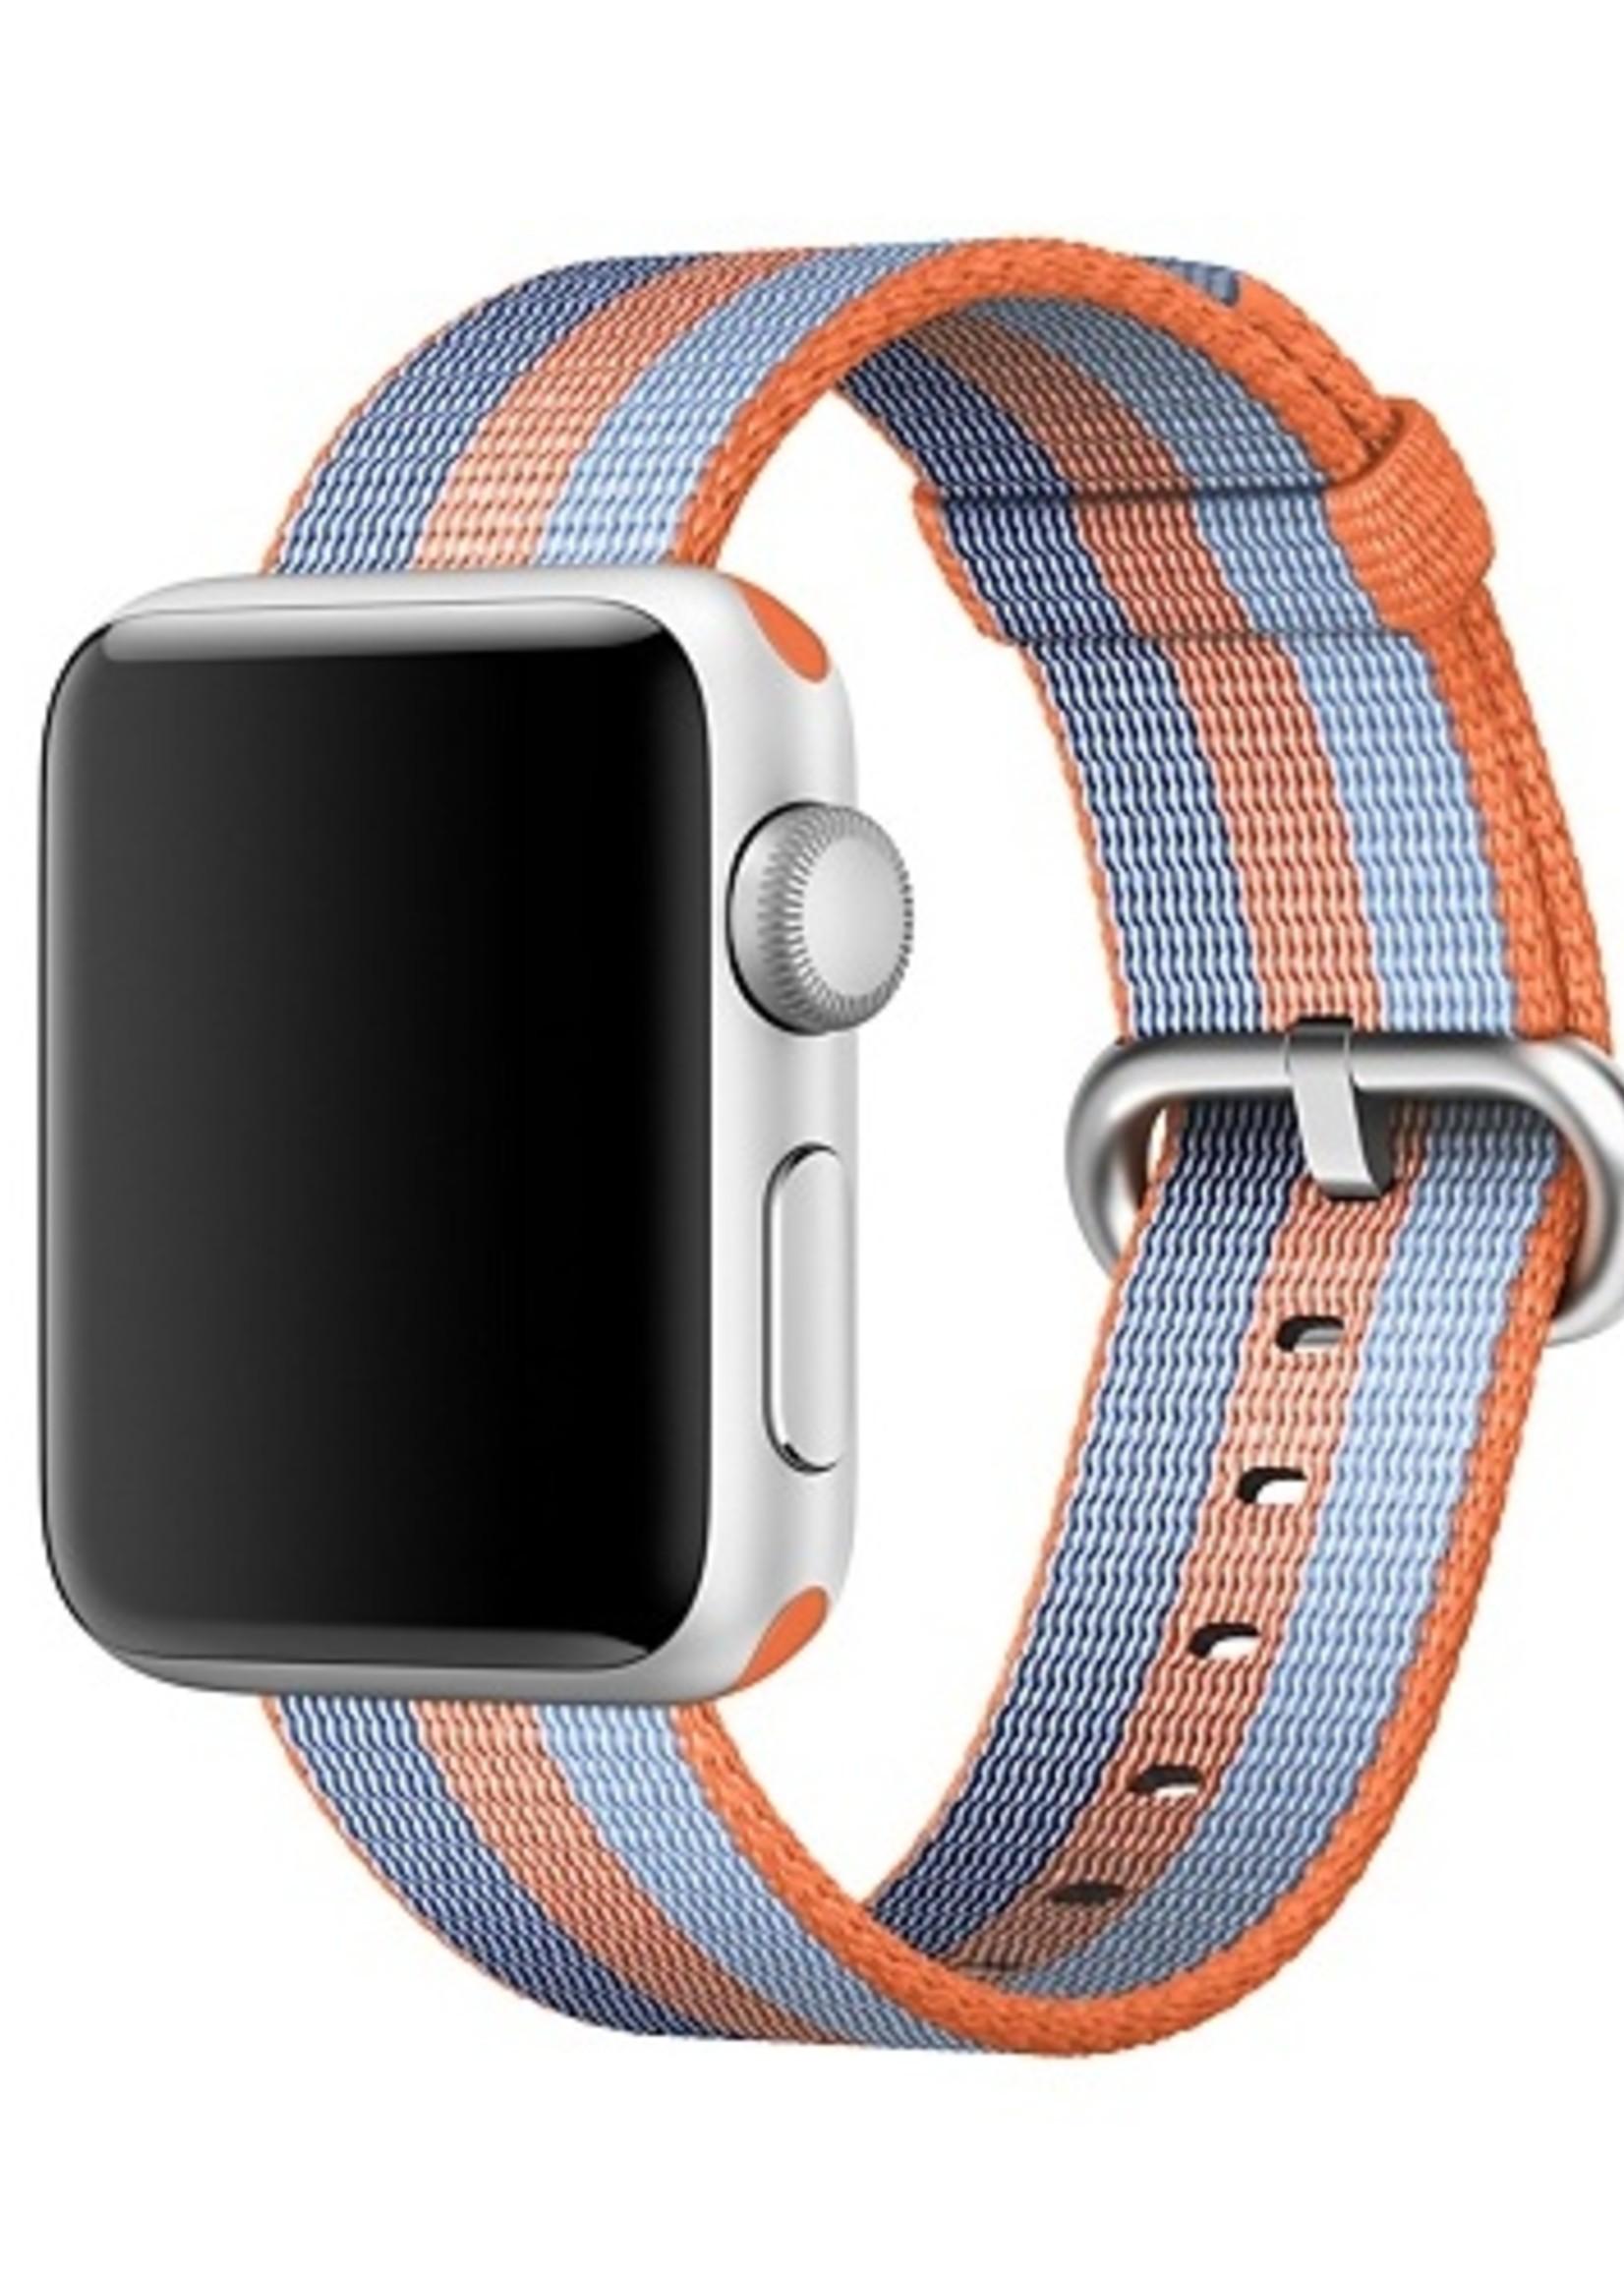 42mm/44mm Orange stripe woven nylon